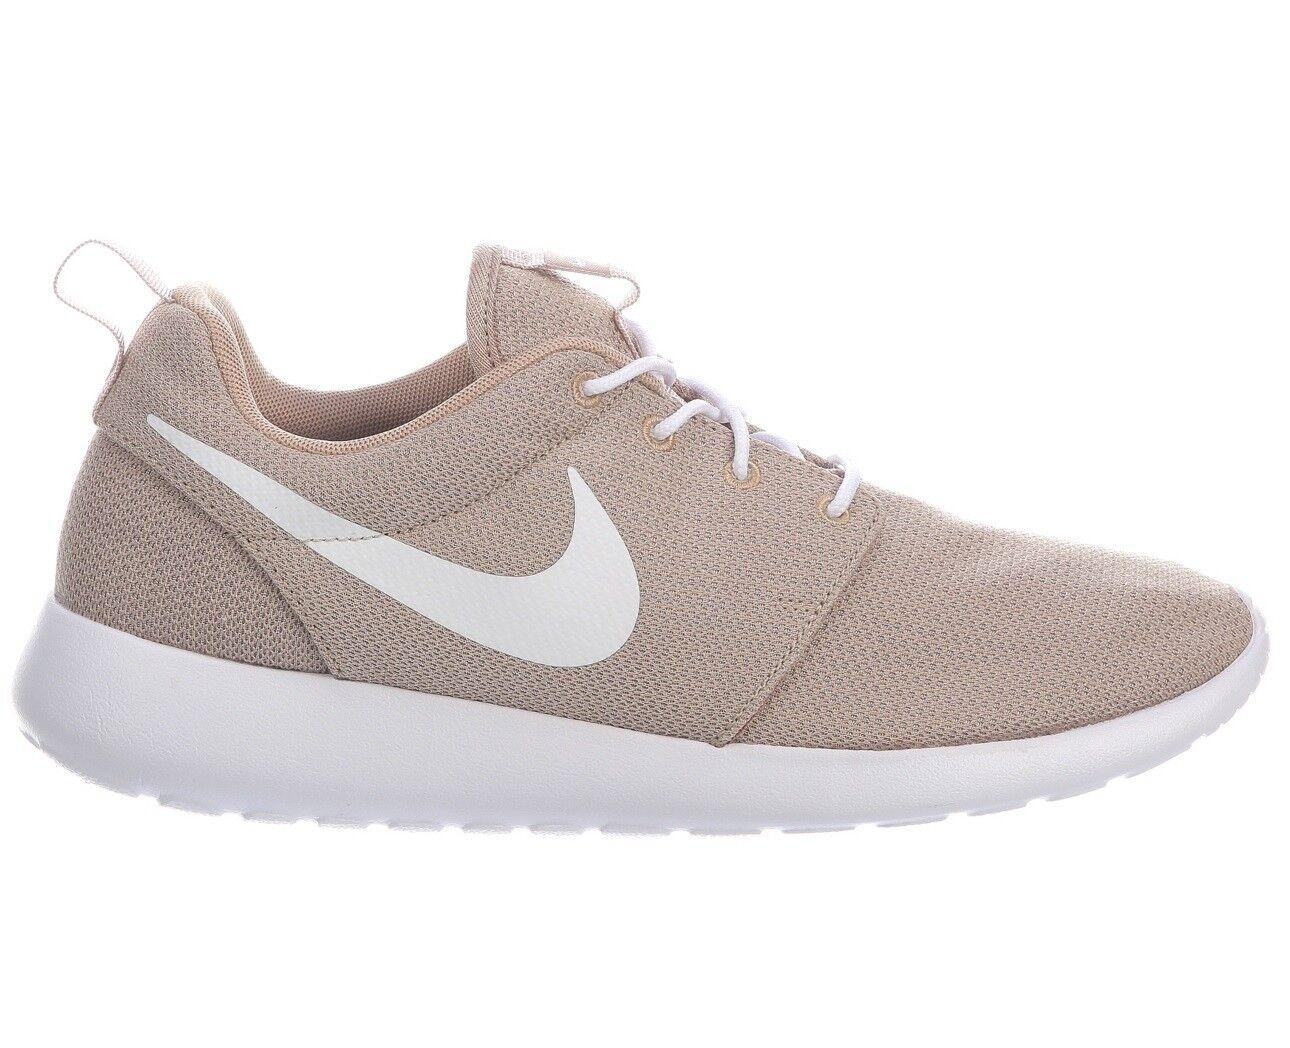 Nike sabbia roshe una Uomo 511881-204 sabbia Nike bianca delle scarpe da corsa numero 13 tessili dbb94d